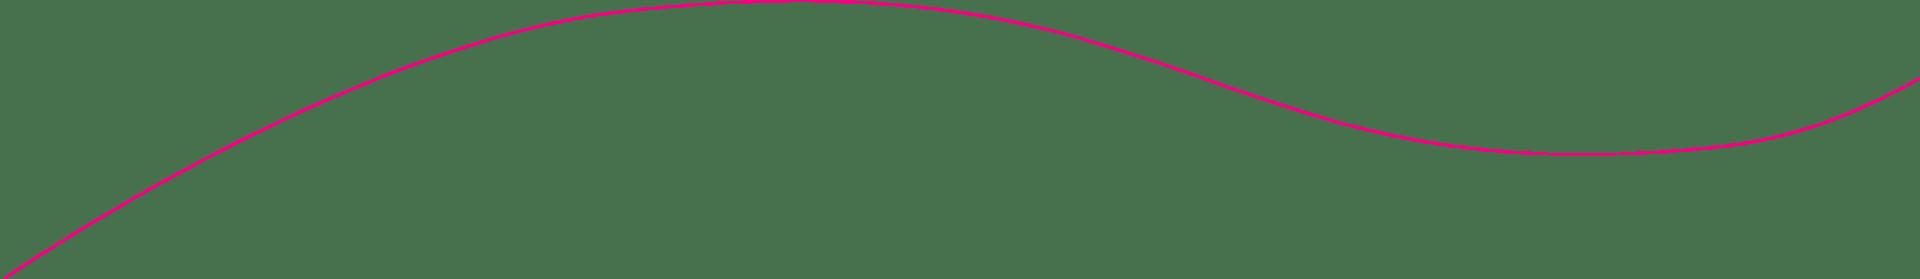 golf-lijn-180